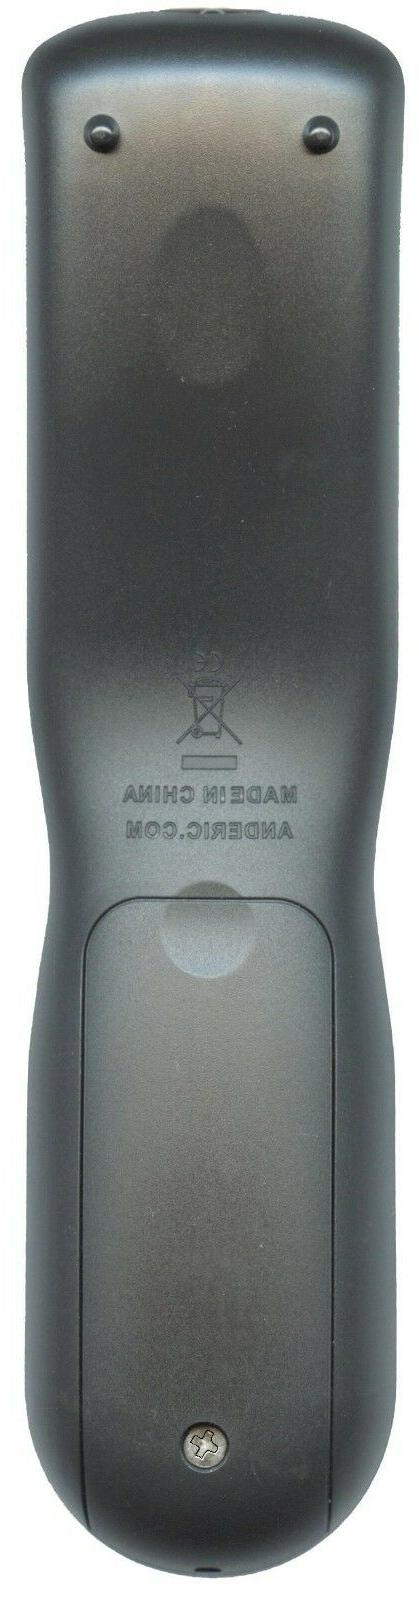 Anderic 4-Device Universal ROKU®, Audio